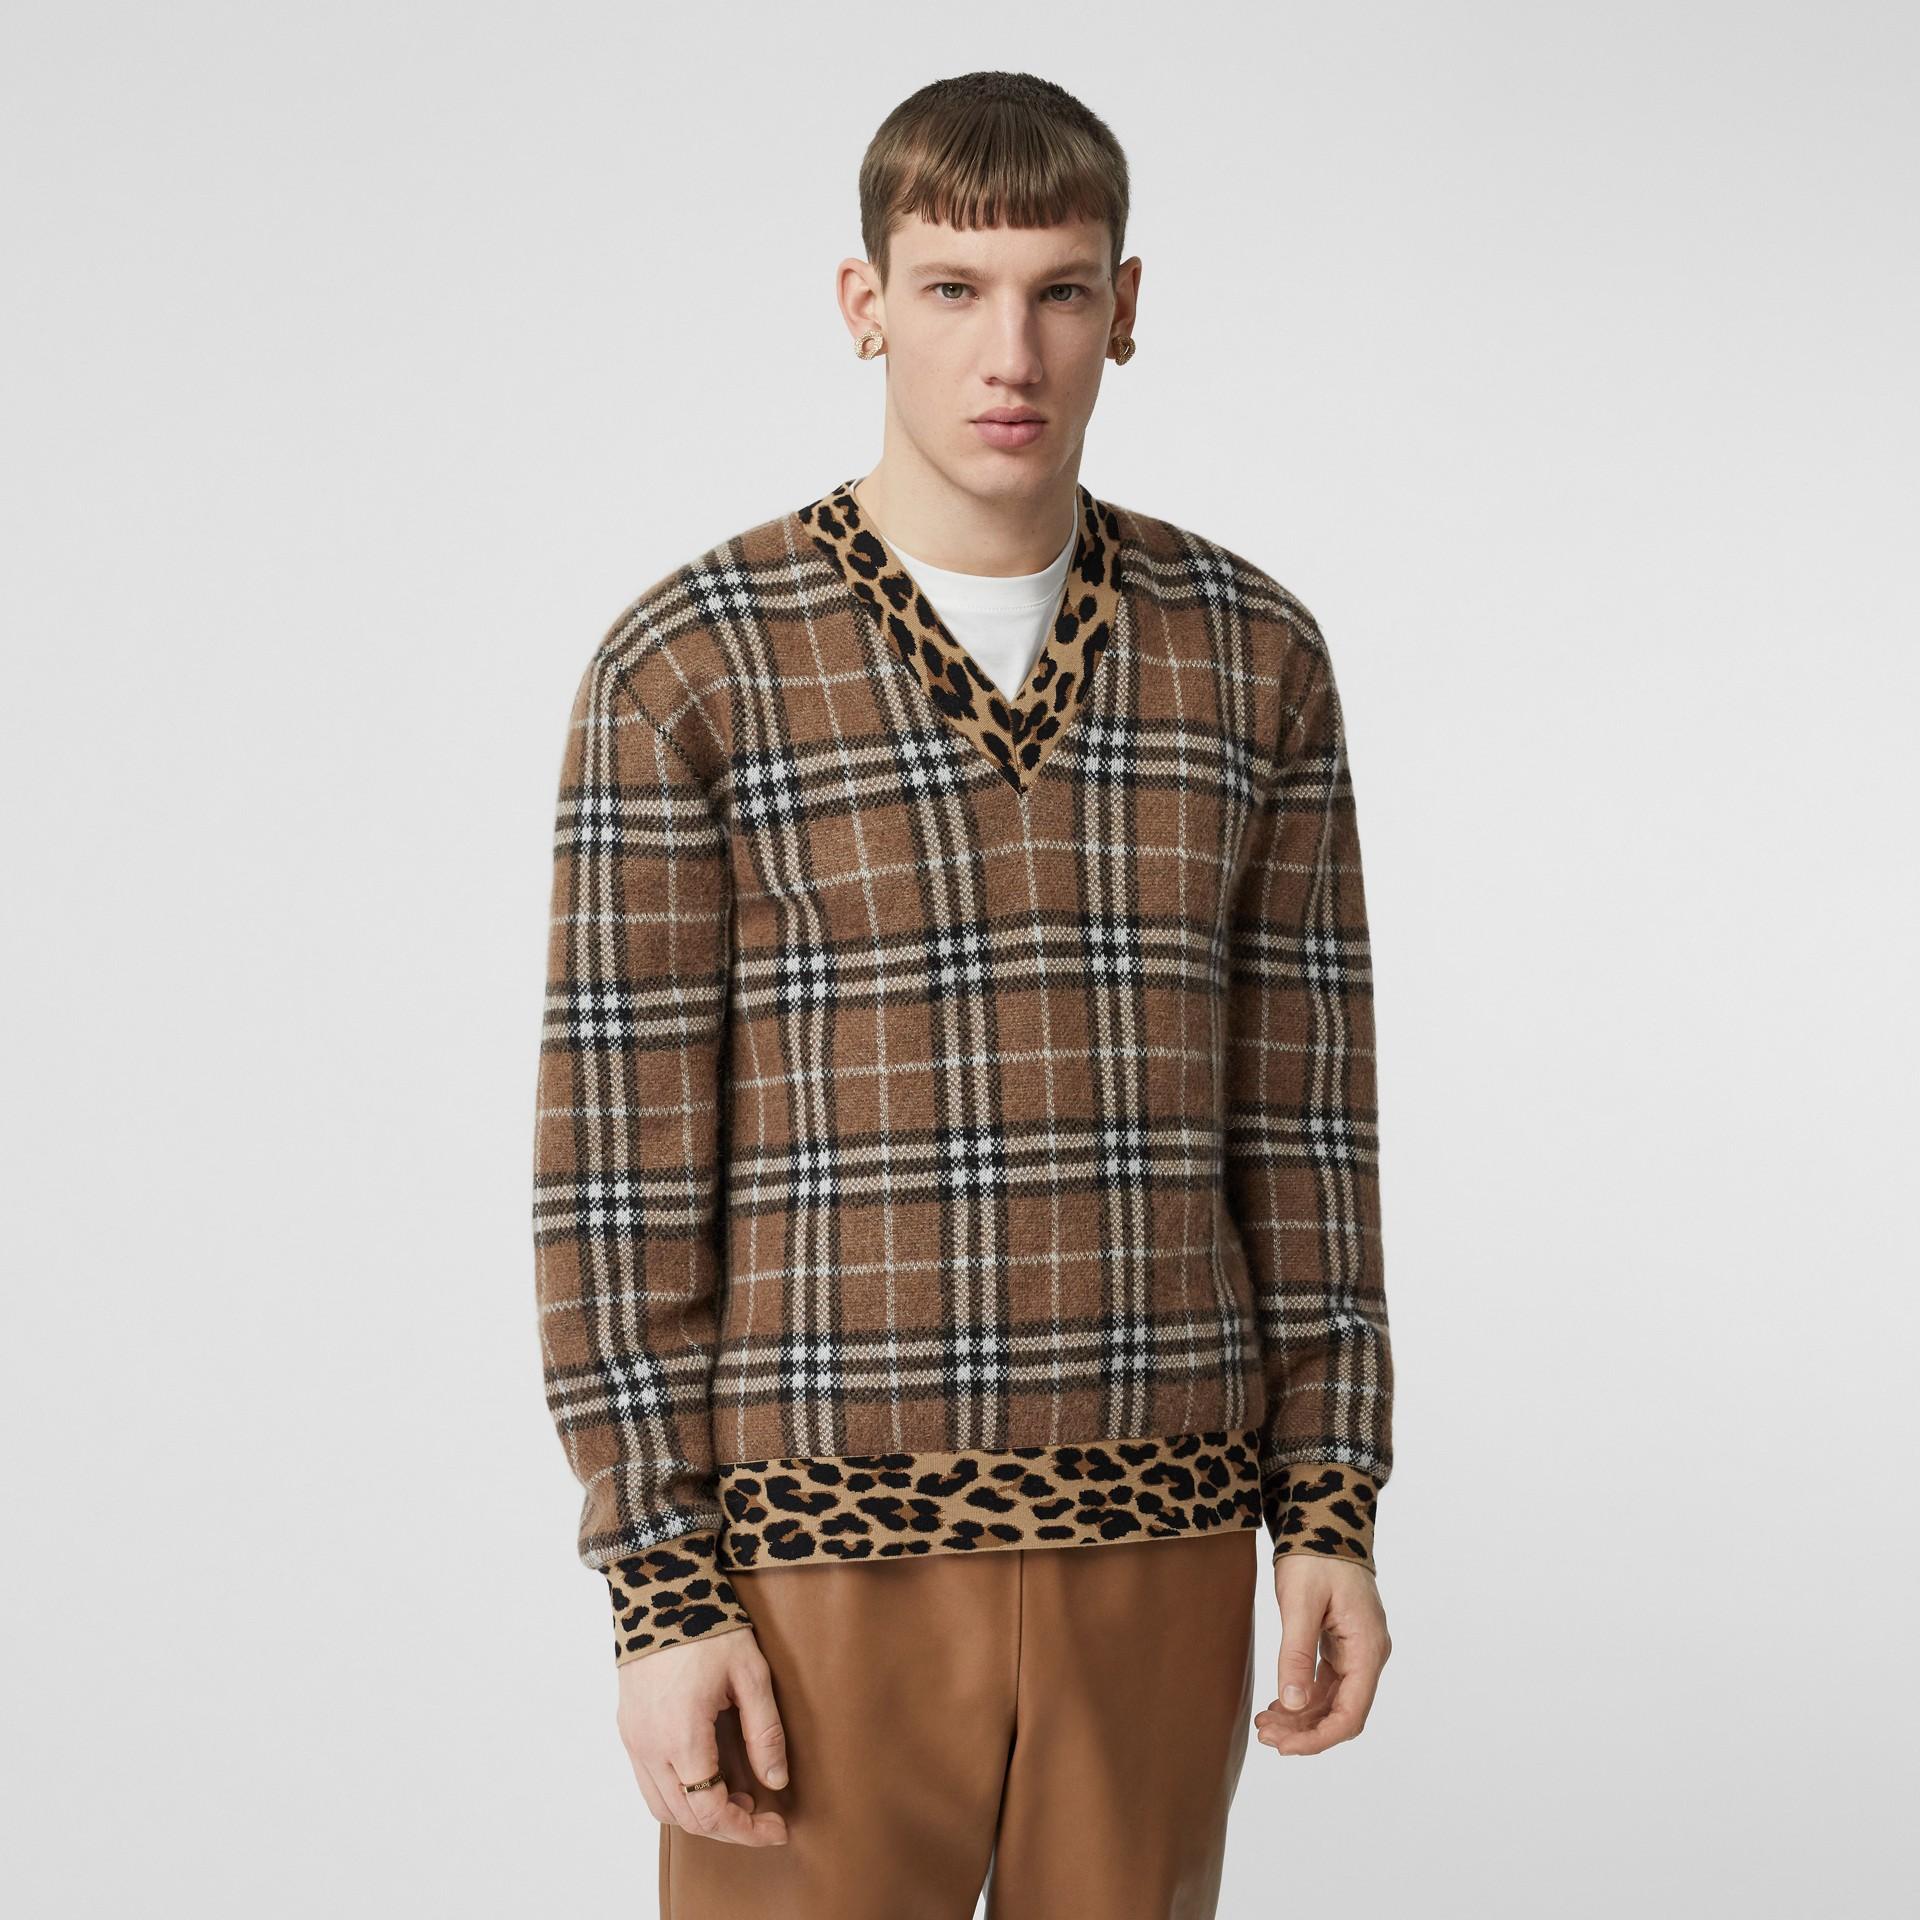 Leopard Detail Vintage Check Cashmere Blend Sweater in Warm Walnut - Men | Burberry United Kingdom - gallery image 0